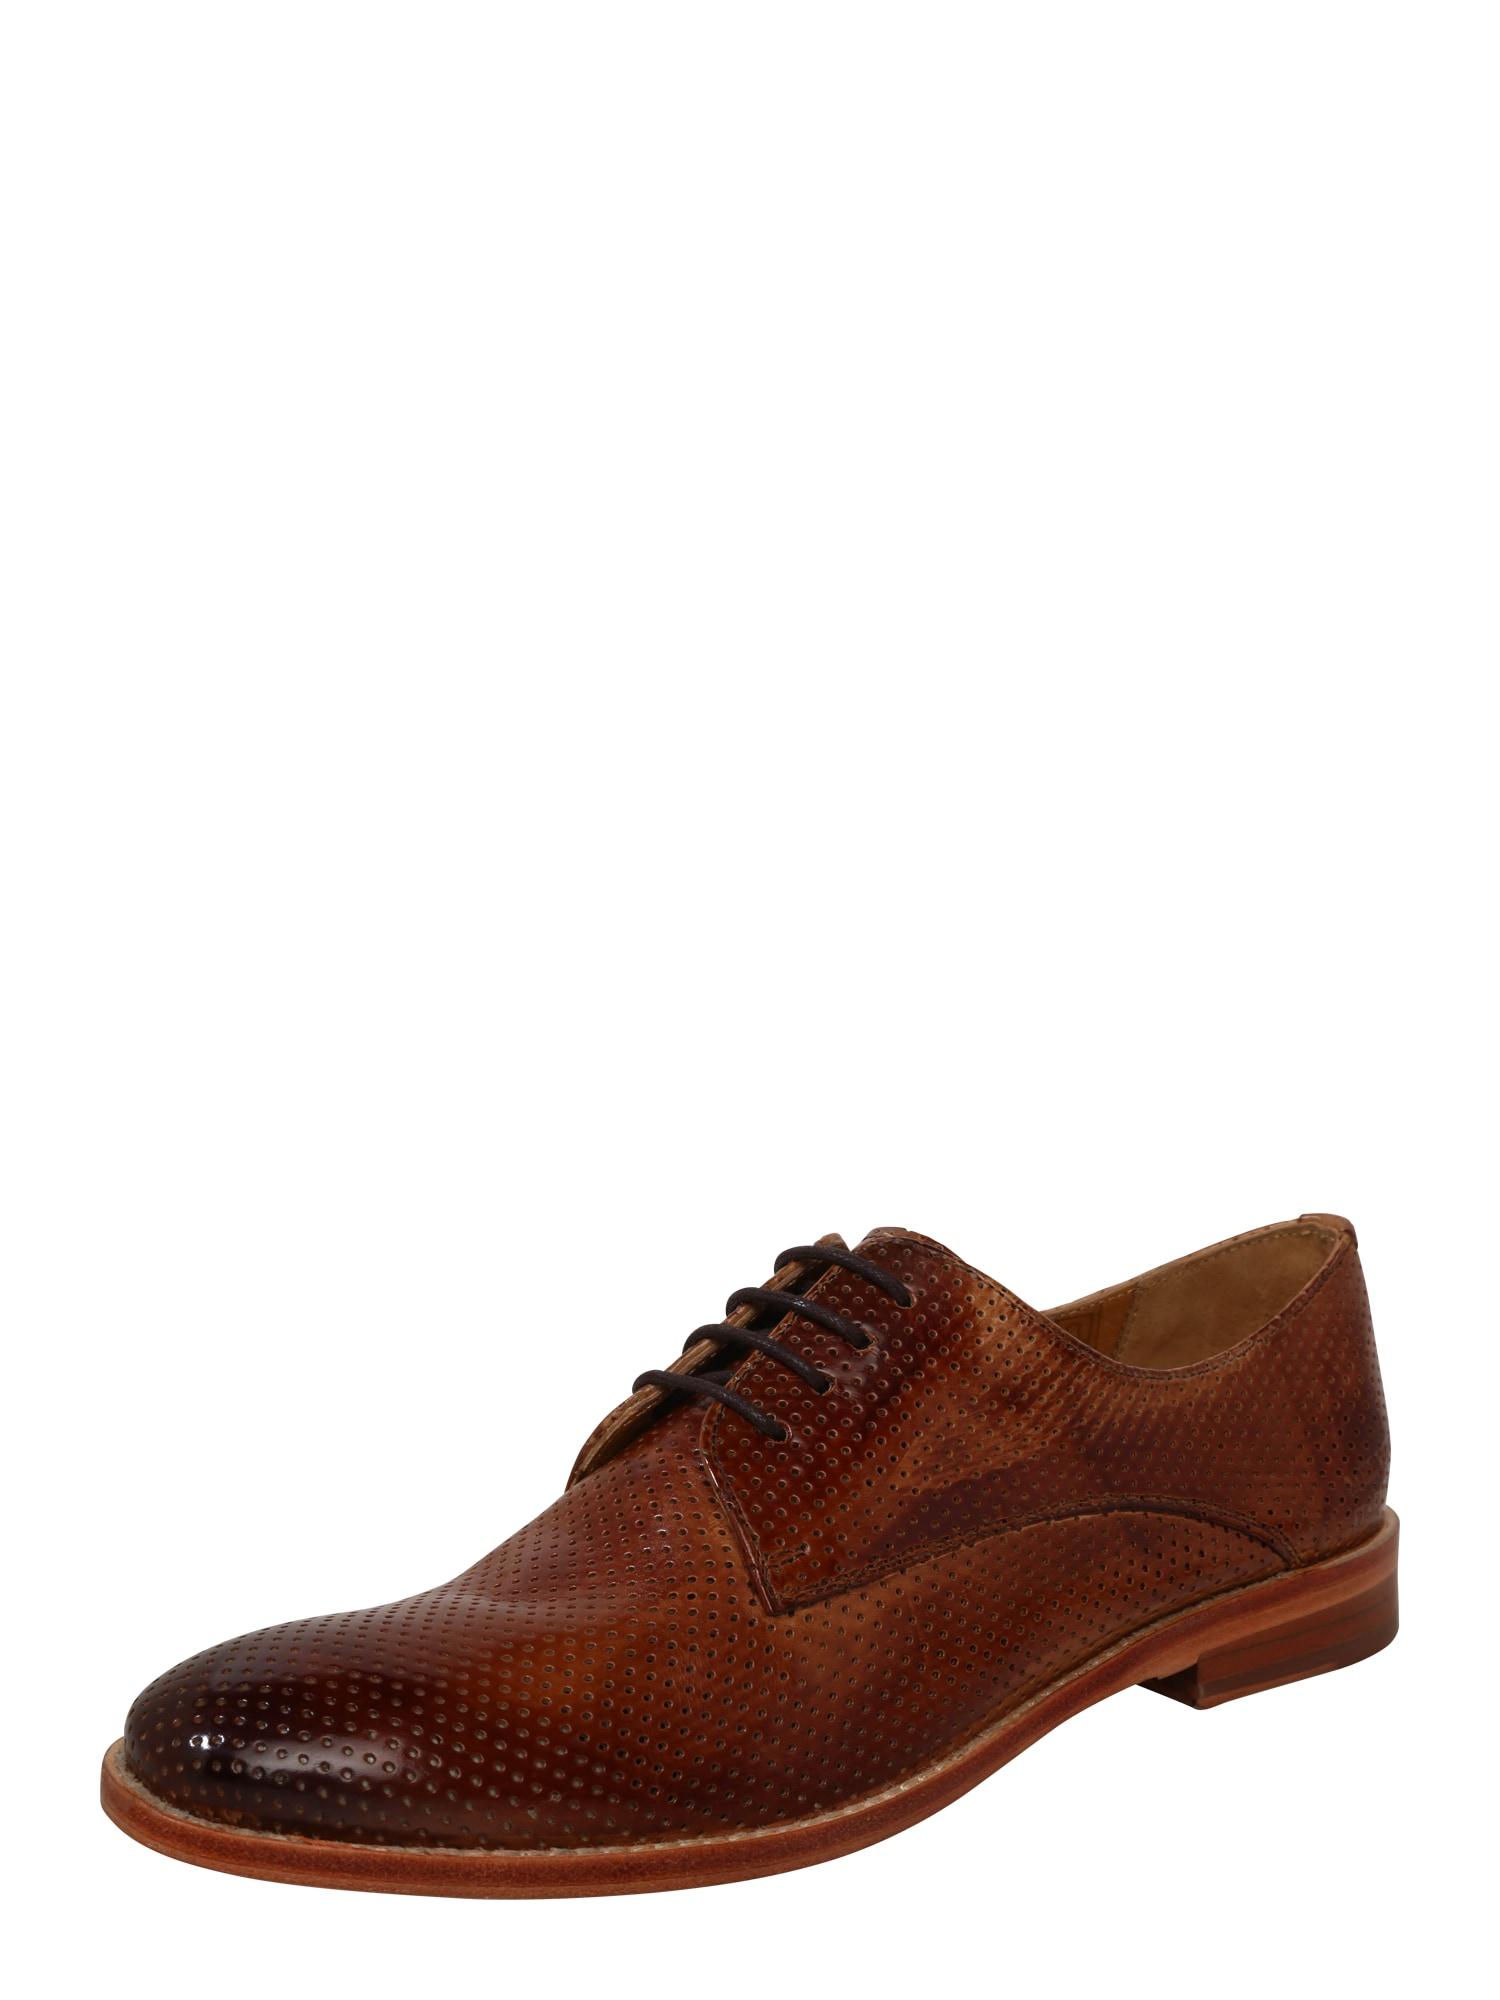 Šněrovací boty Amelie 14 hnědá MELVIN & HAMILTON